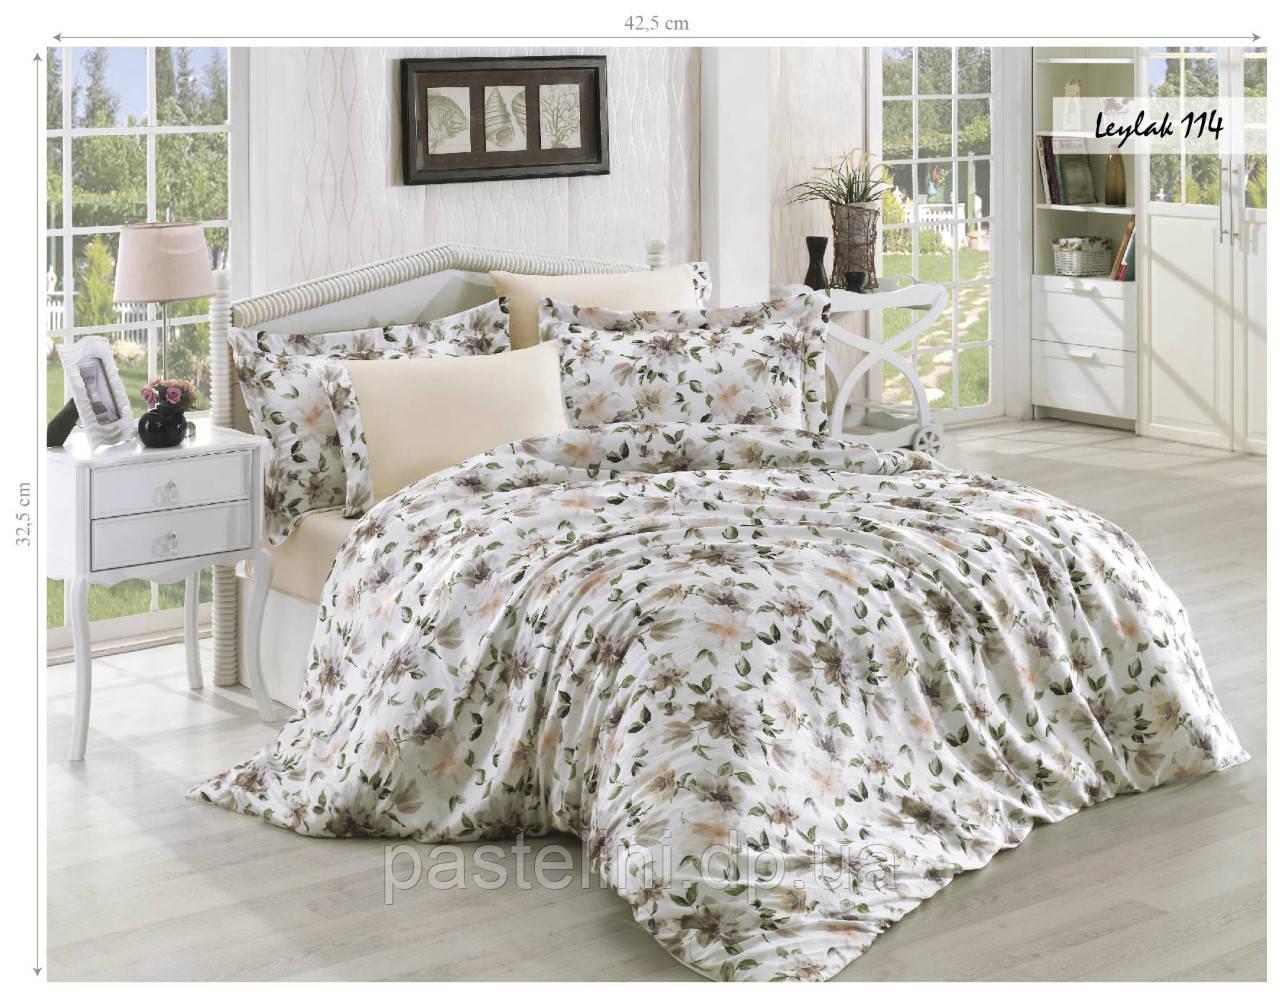 Комплект постельного белья Issihome сатин+жатый шелк Leylak 114